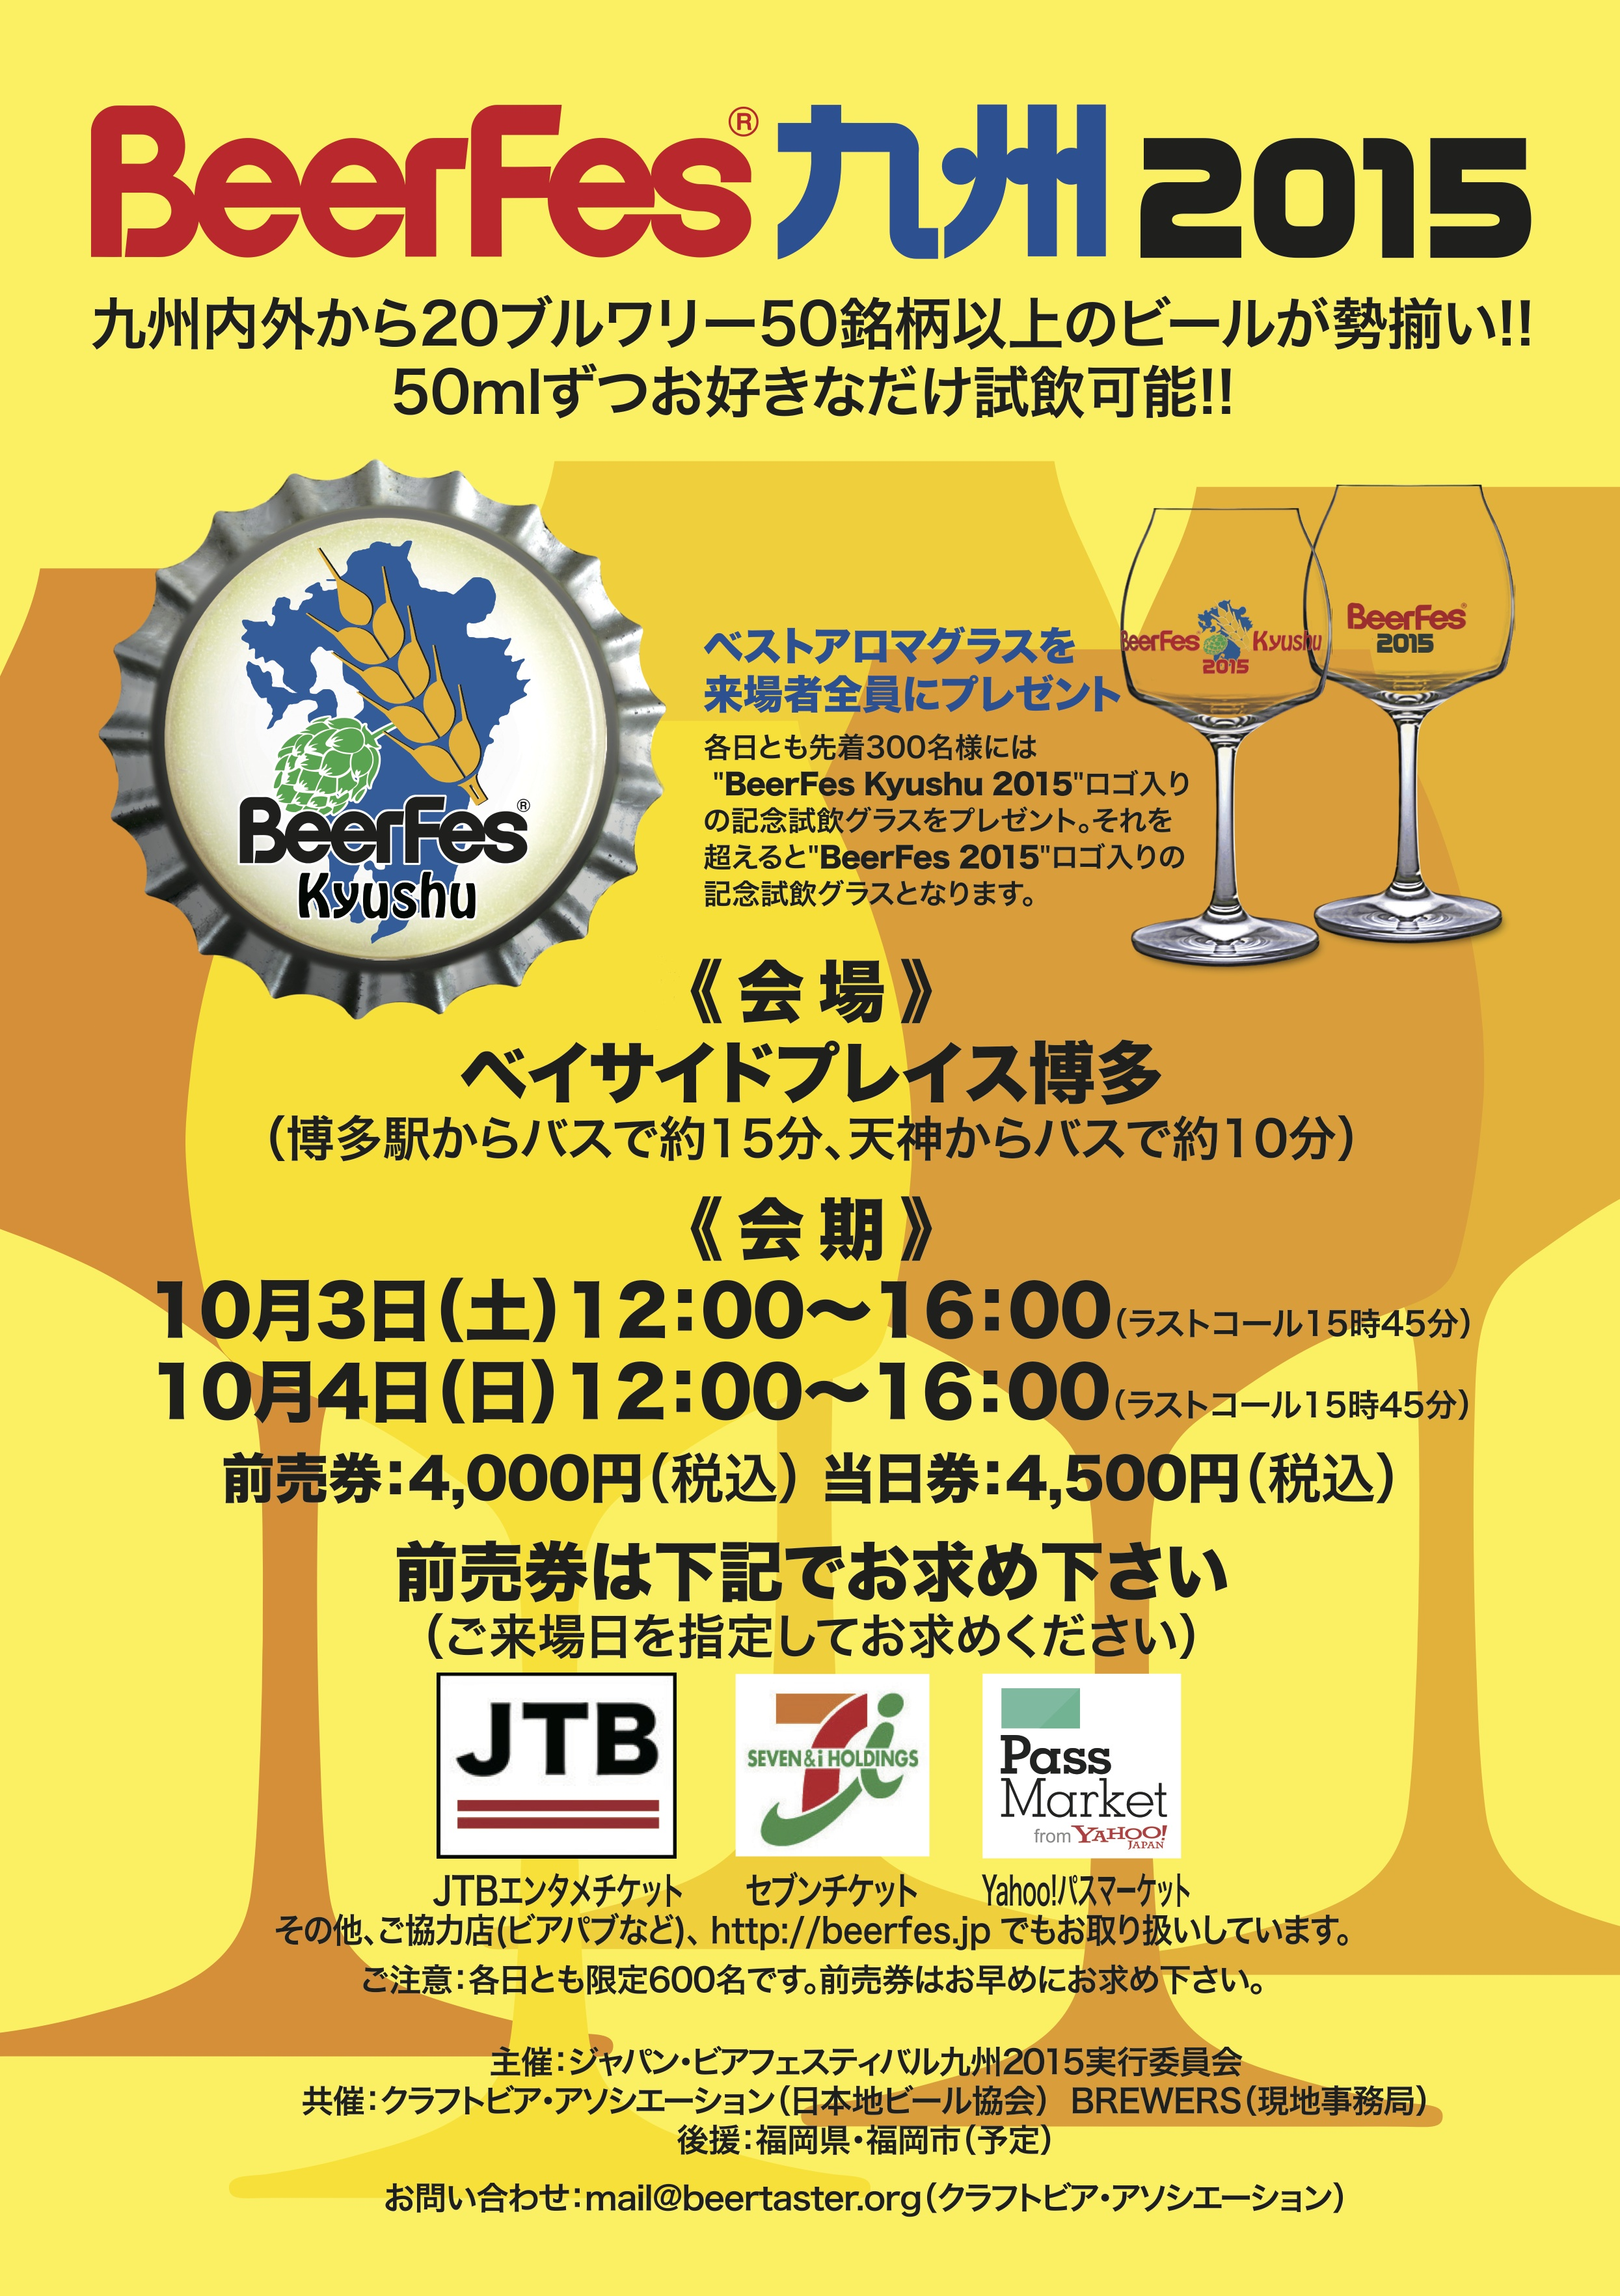 BeerFes九州ポスター のコピー